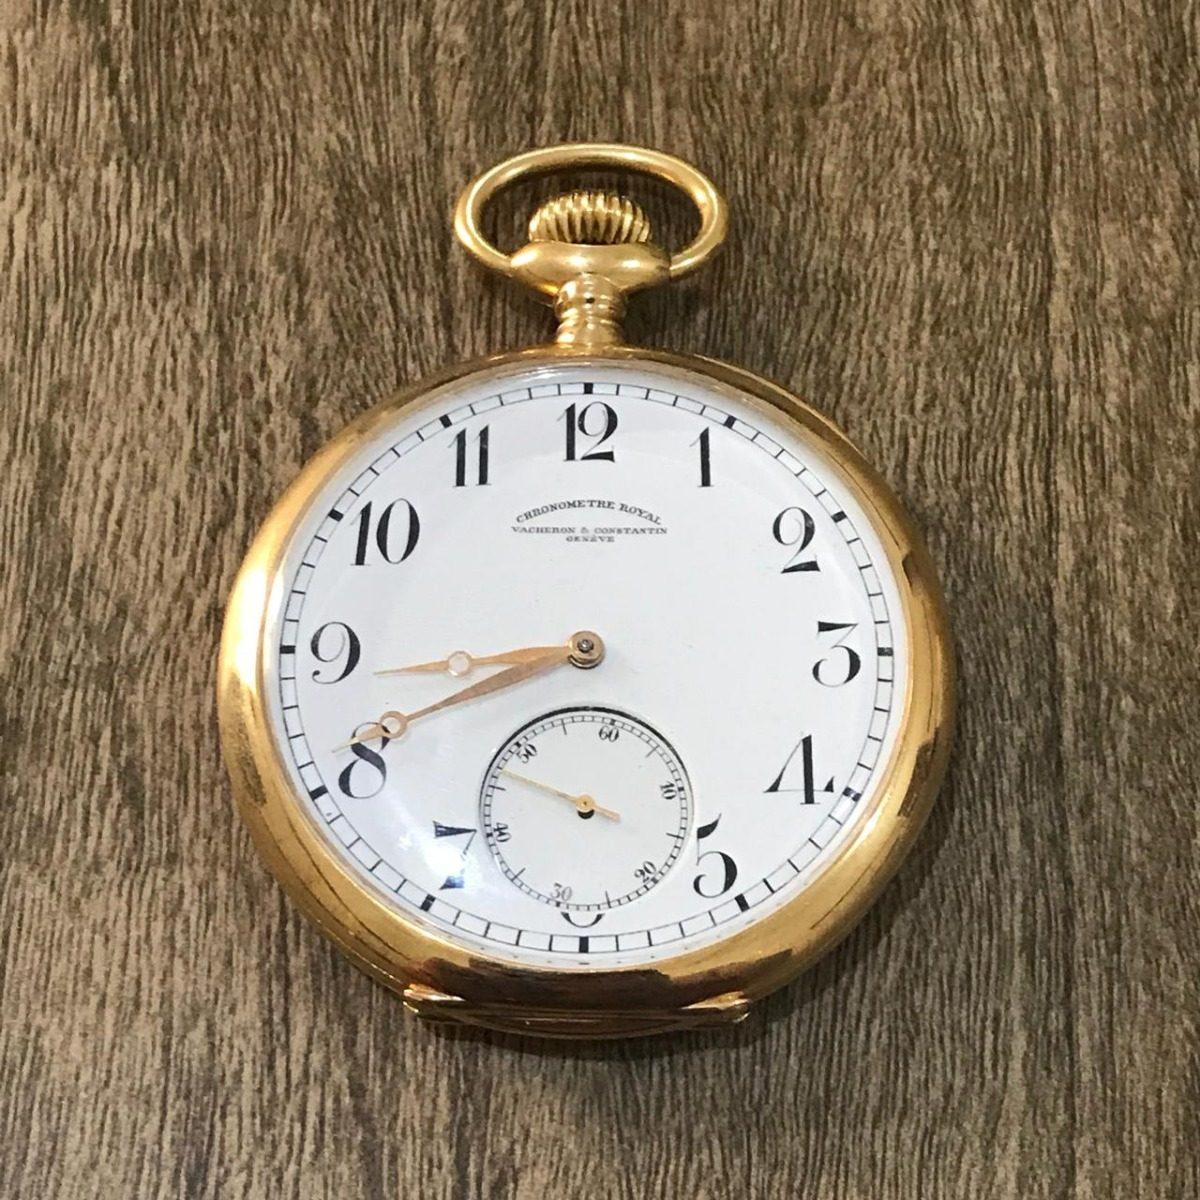 7e117eef0cf relógio de bolso em ouro 18k vacheron   constantin. Carregando zoom.